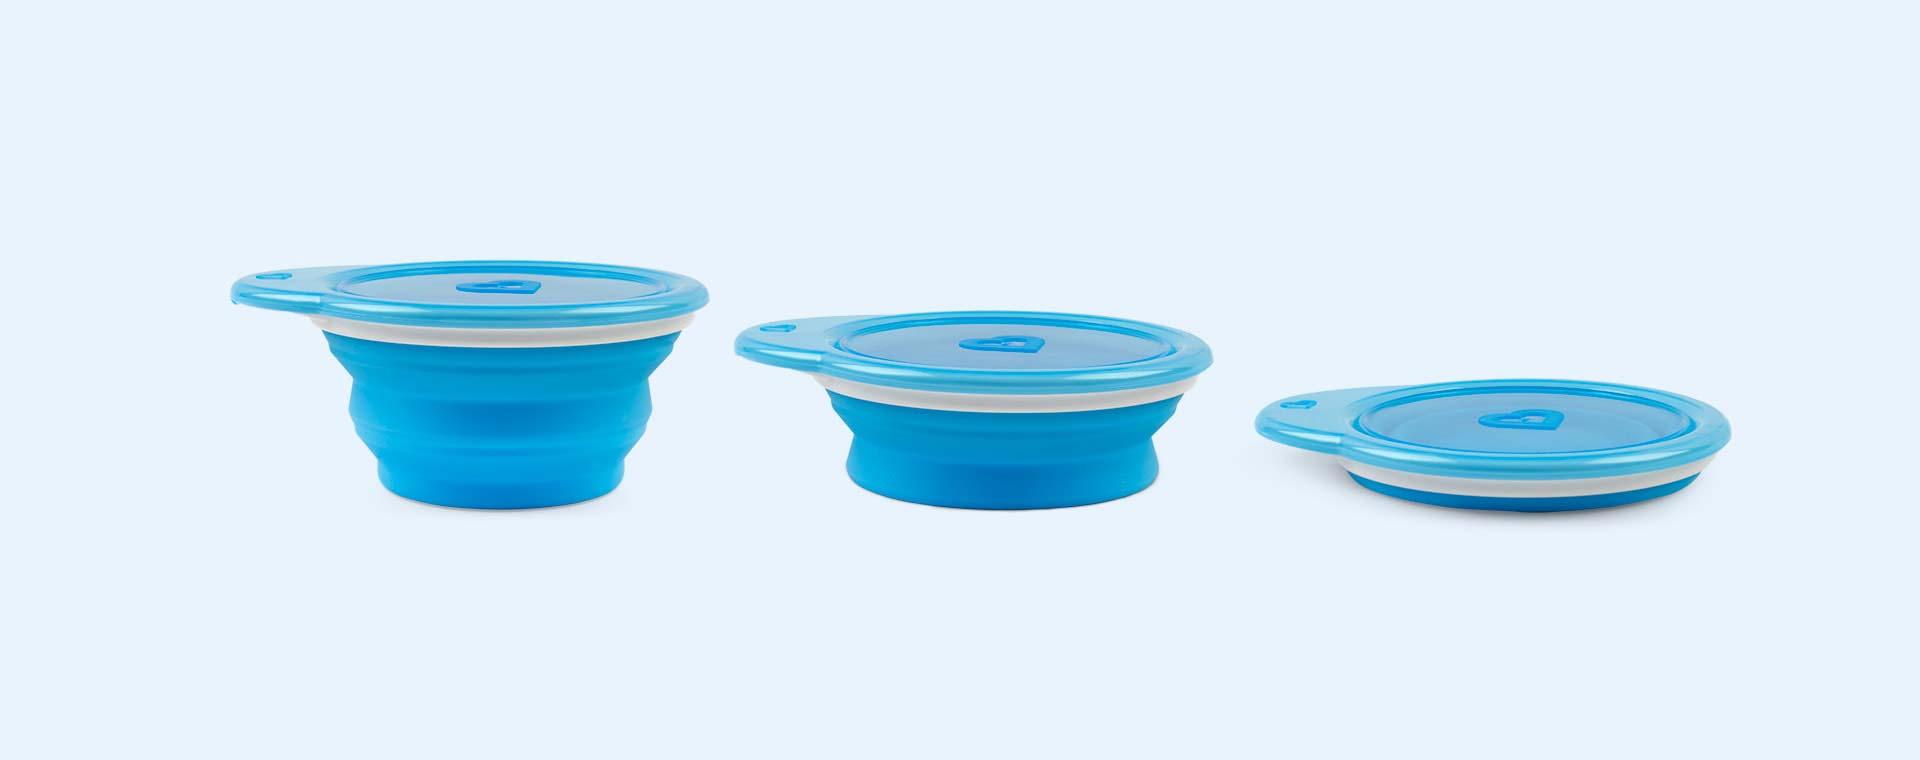 Blue Munchkin Go Bowl